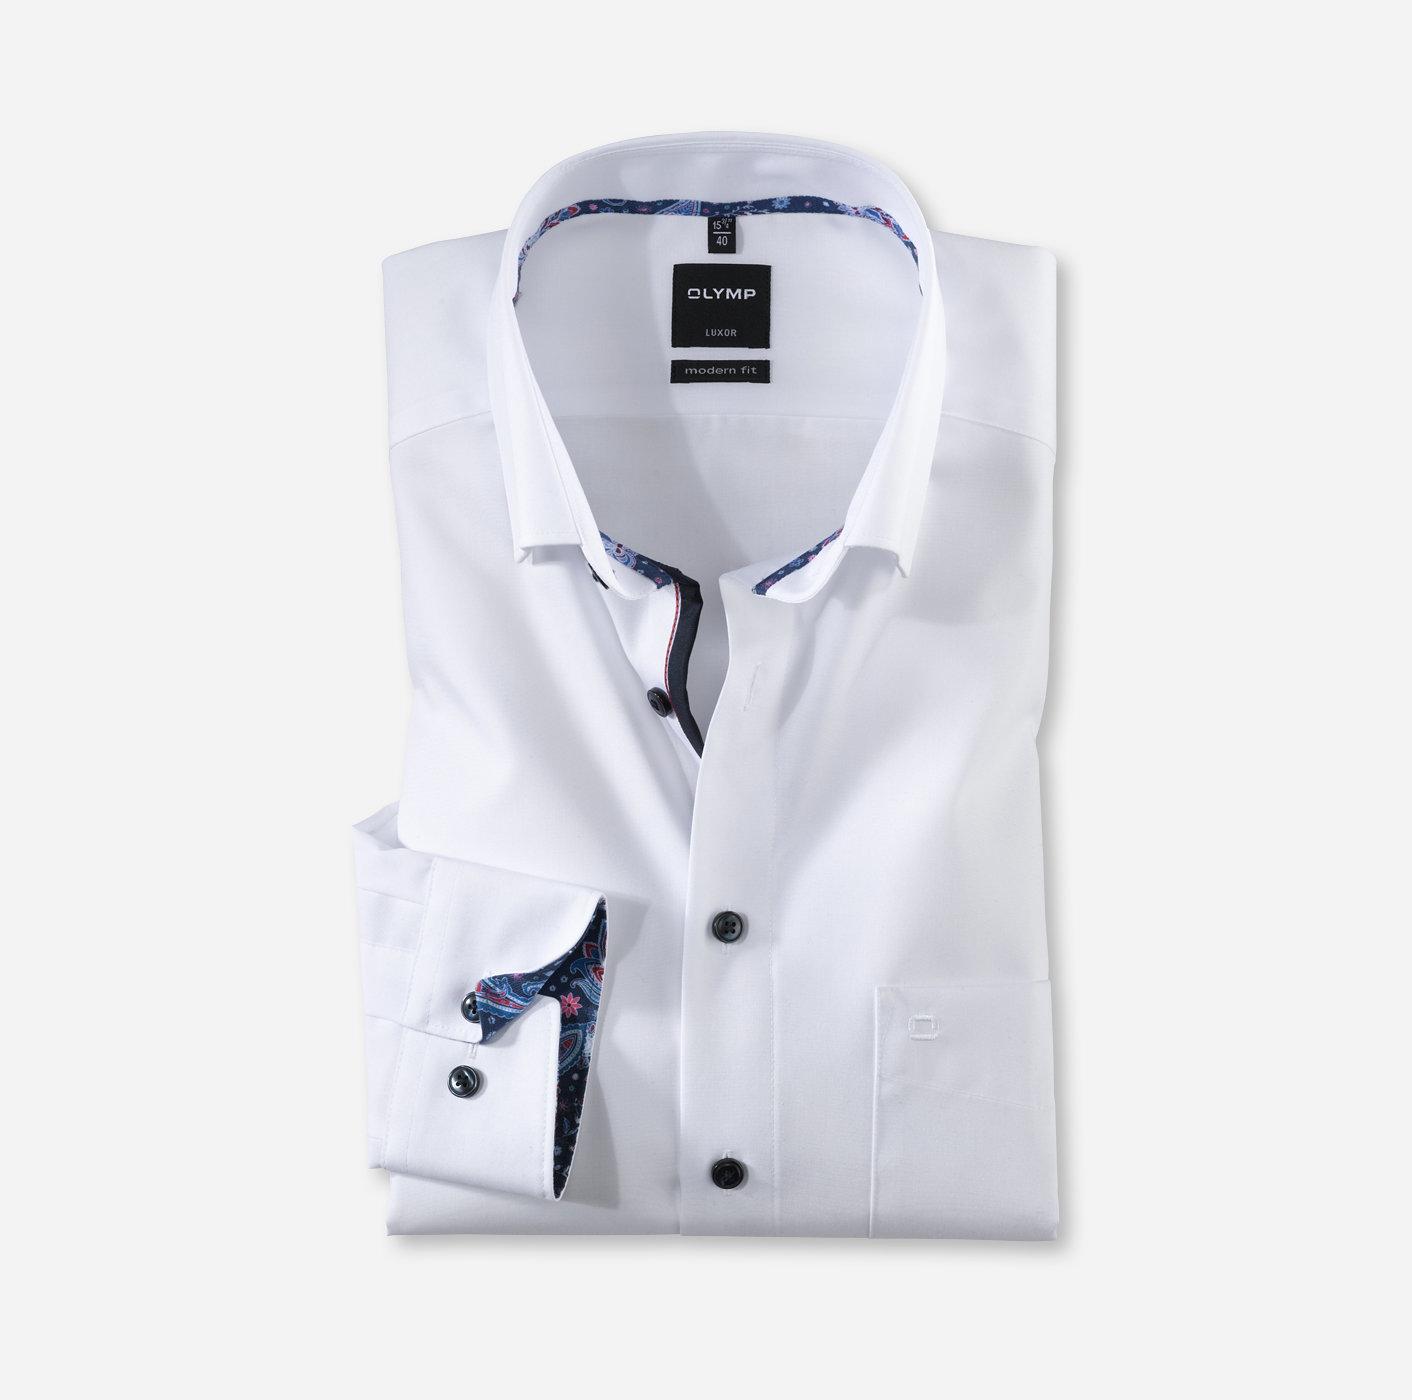 Business shirt   OLYMP Luxor, modern fit, Under button down ...